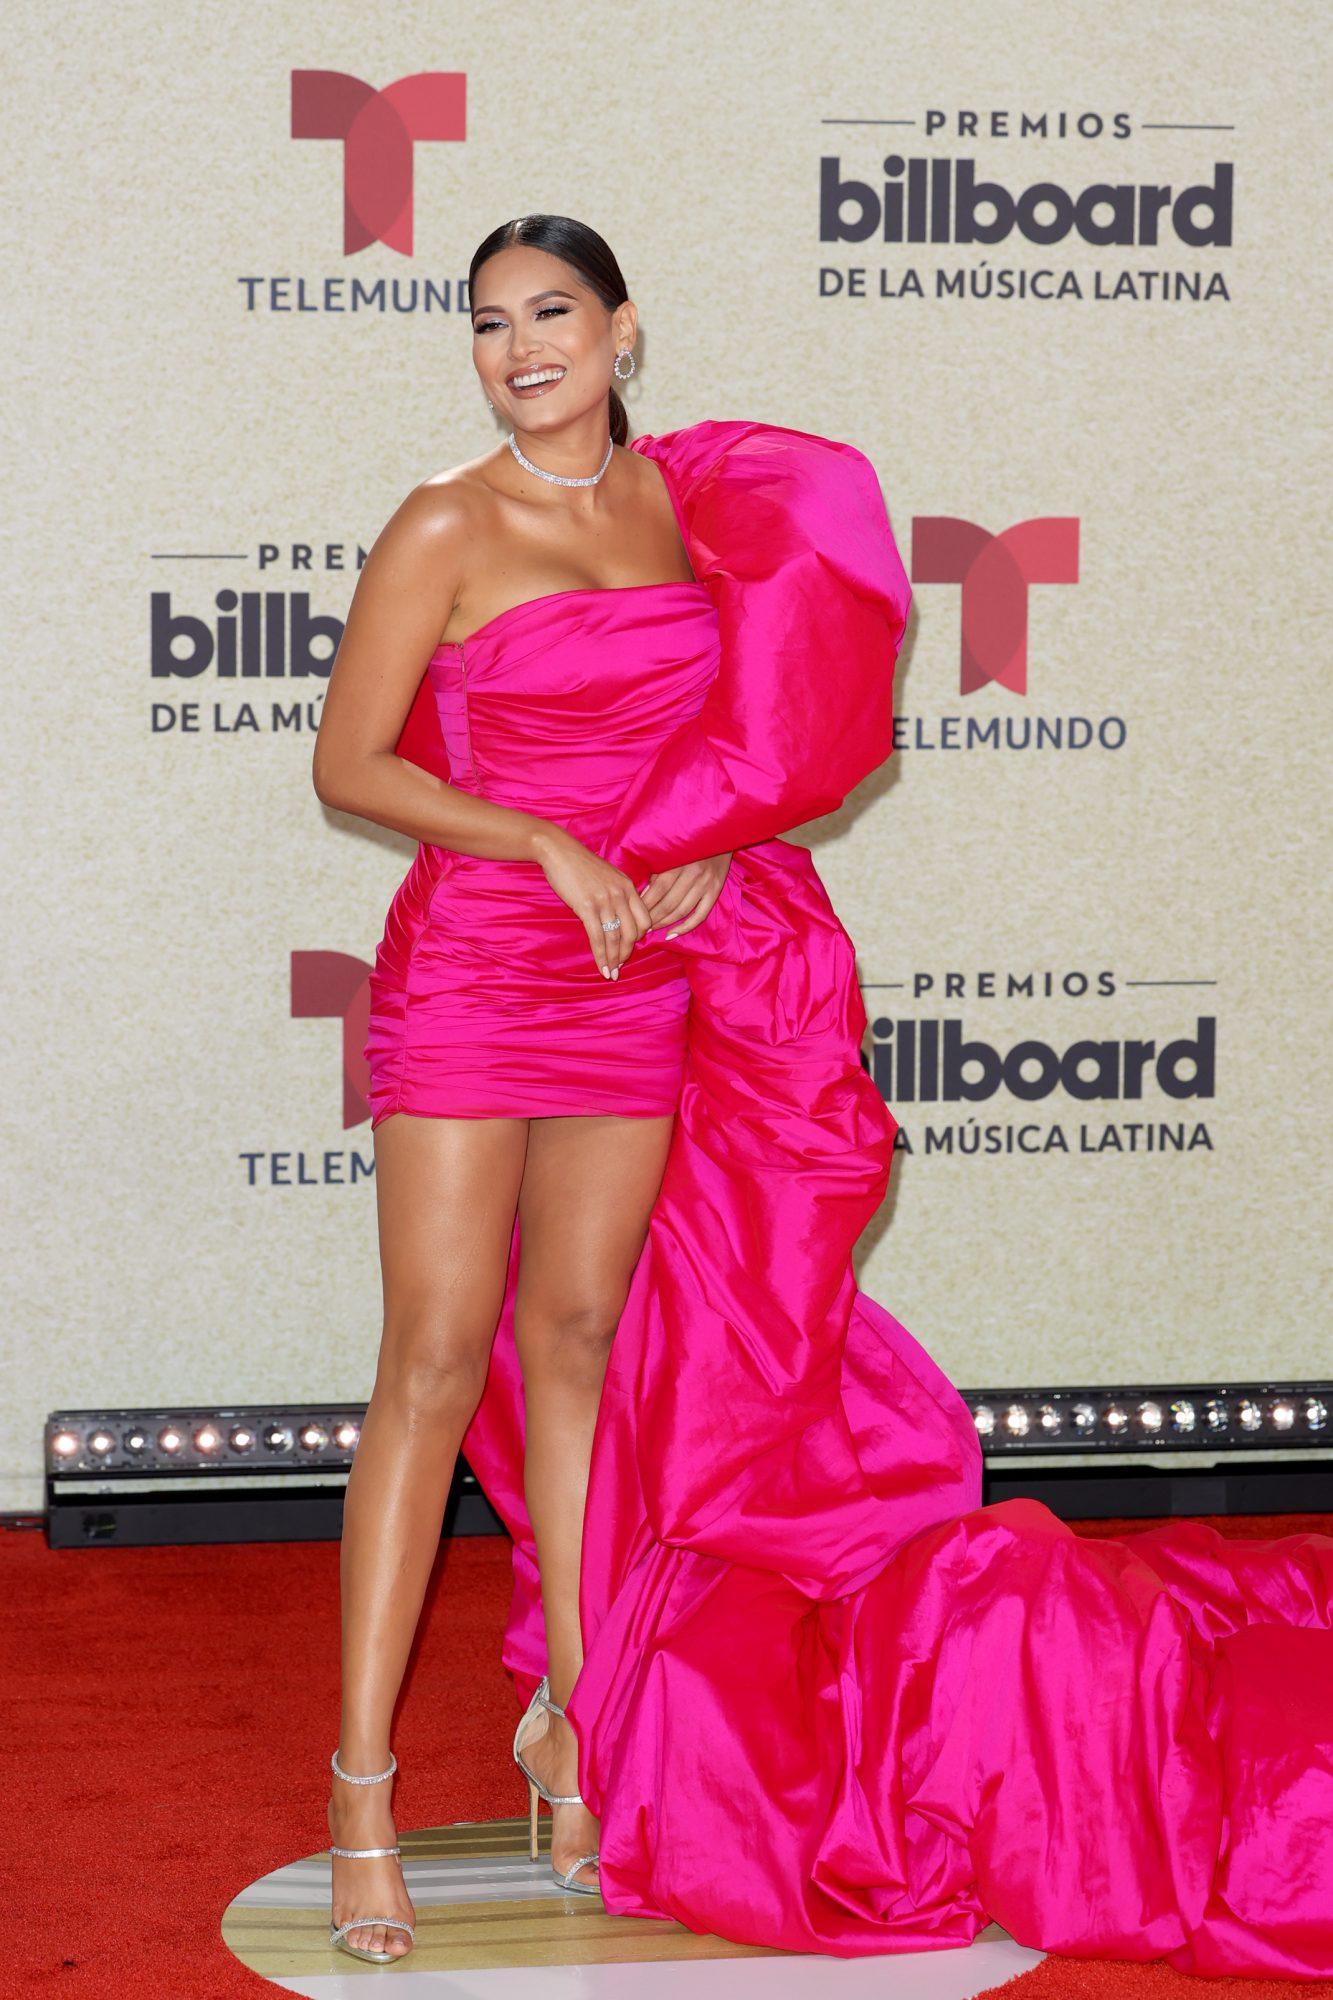 Andrea Meza, Premios Billboard 2021